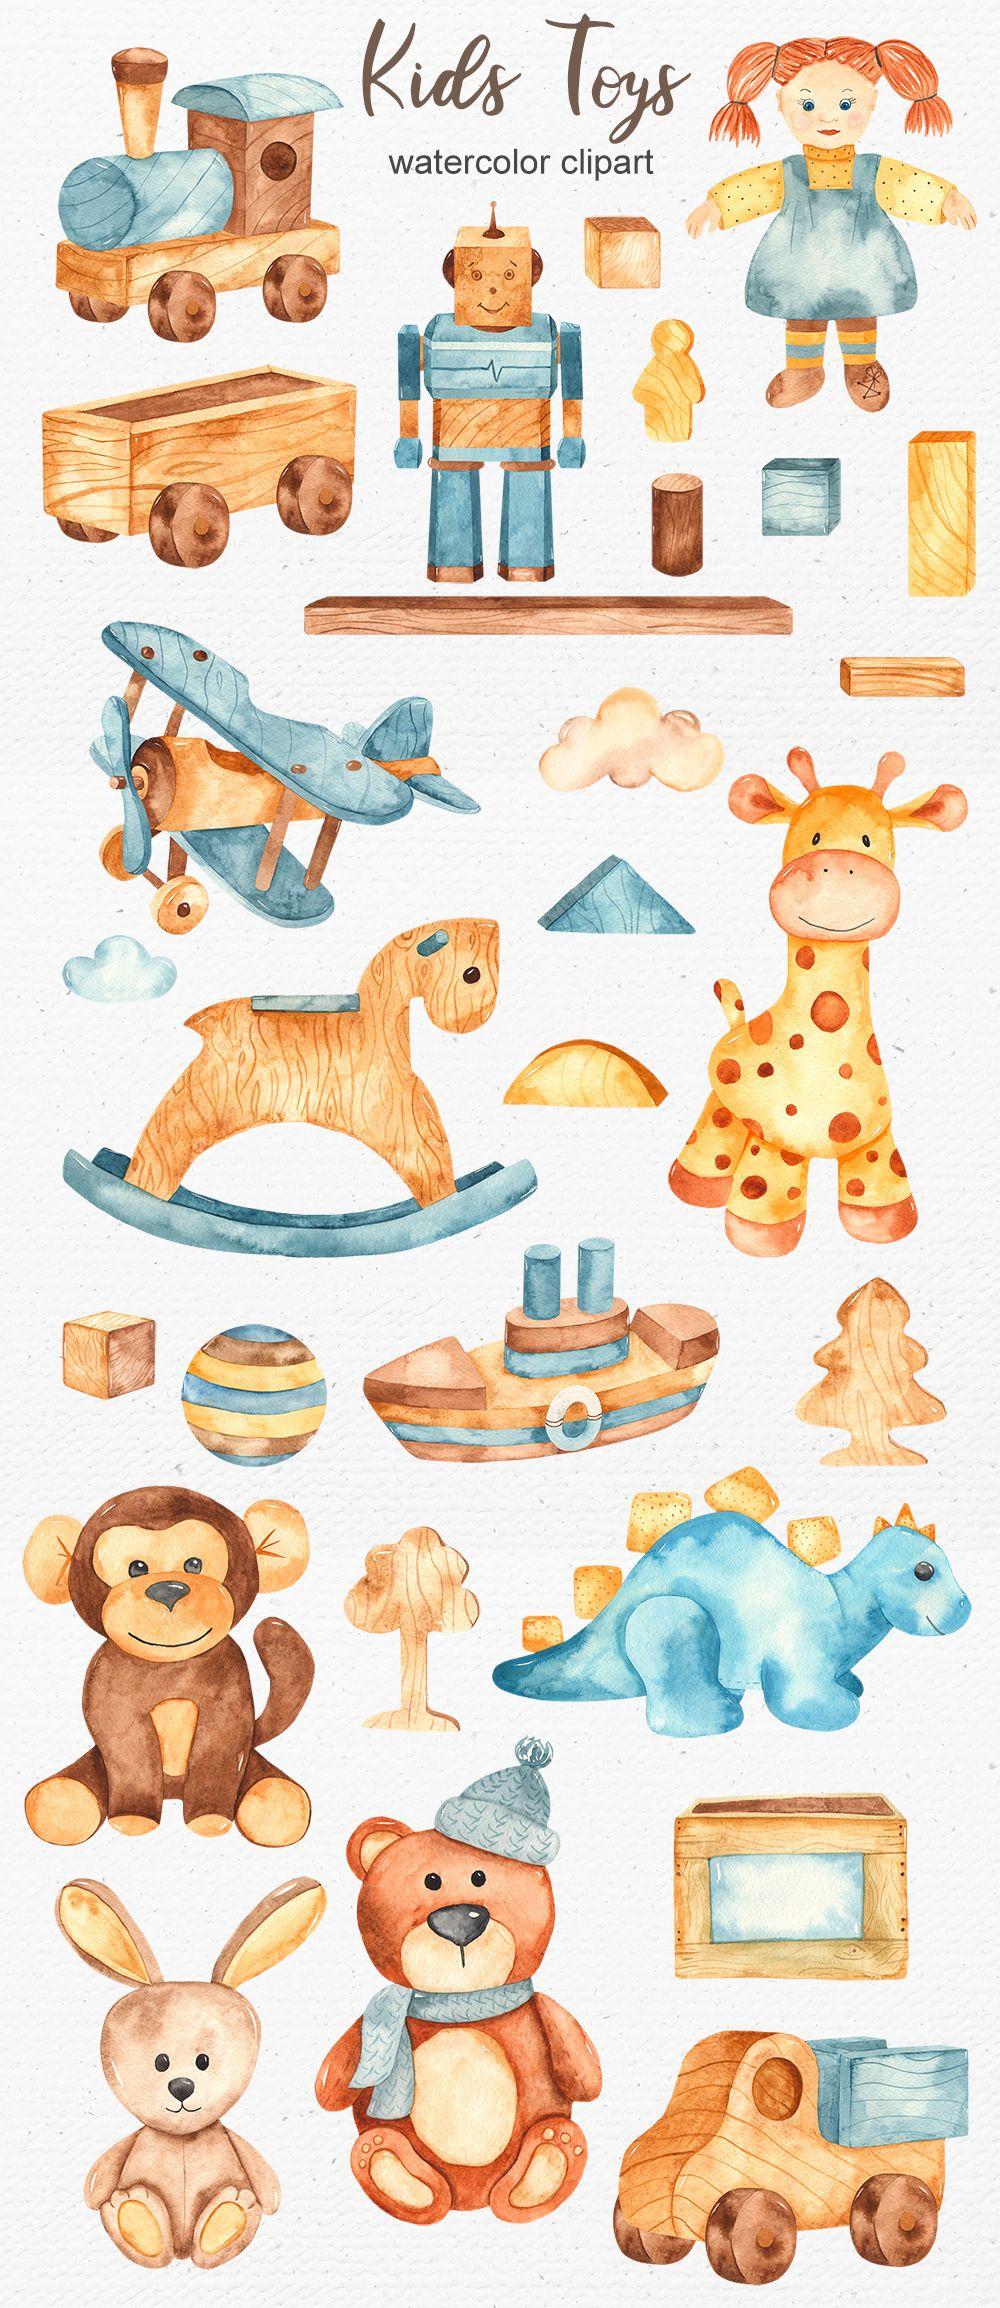 Kids Toys Watercolor Clipart Giraffe Illustration Illustration Art Kids Kids Watercolor